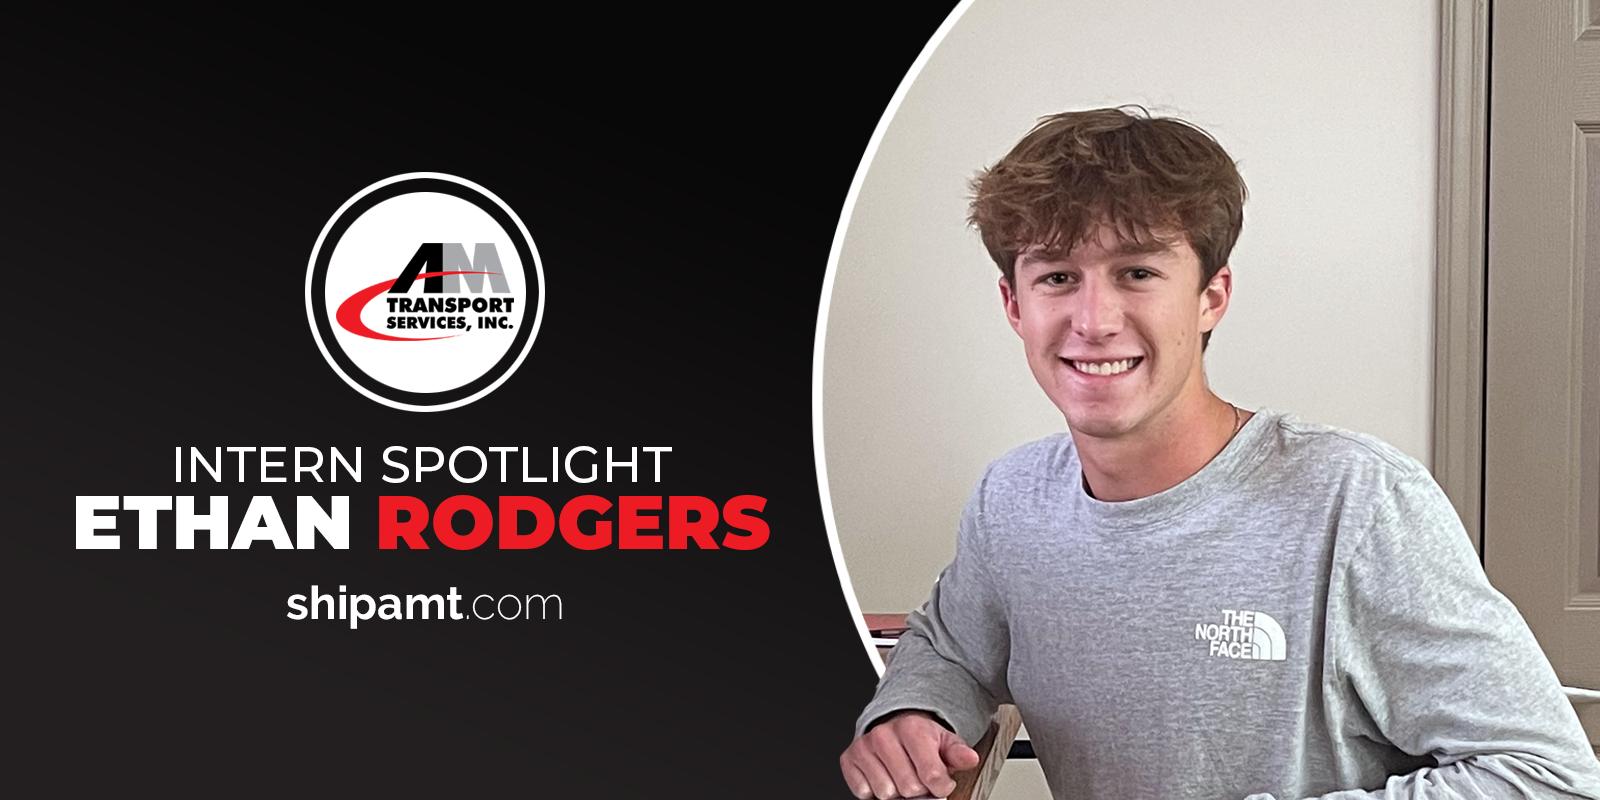 Intern Spotlight: Ethan Rodgers